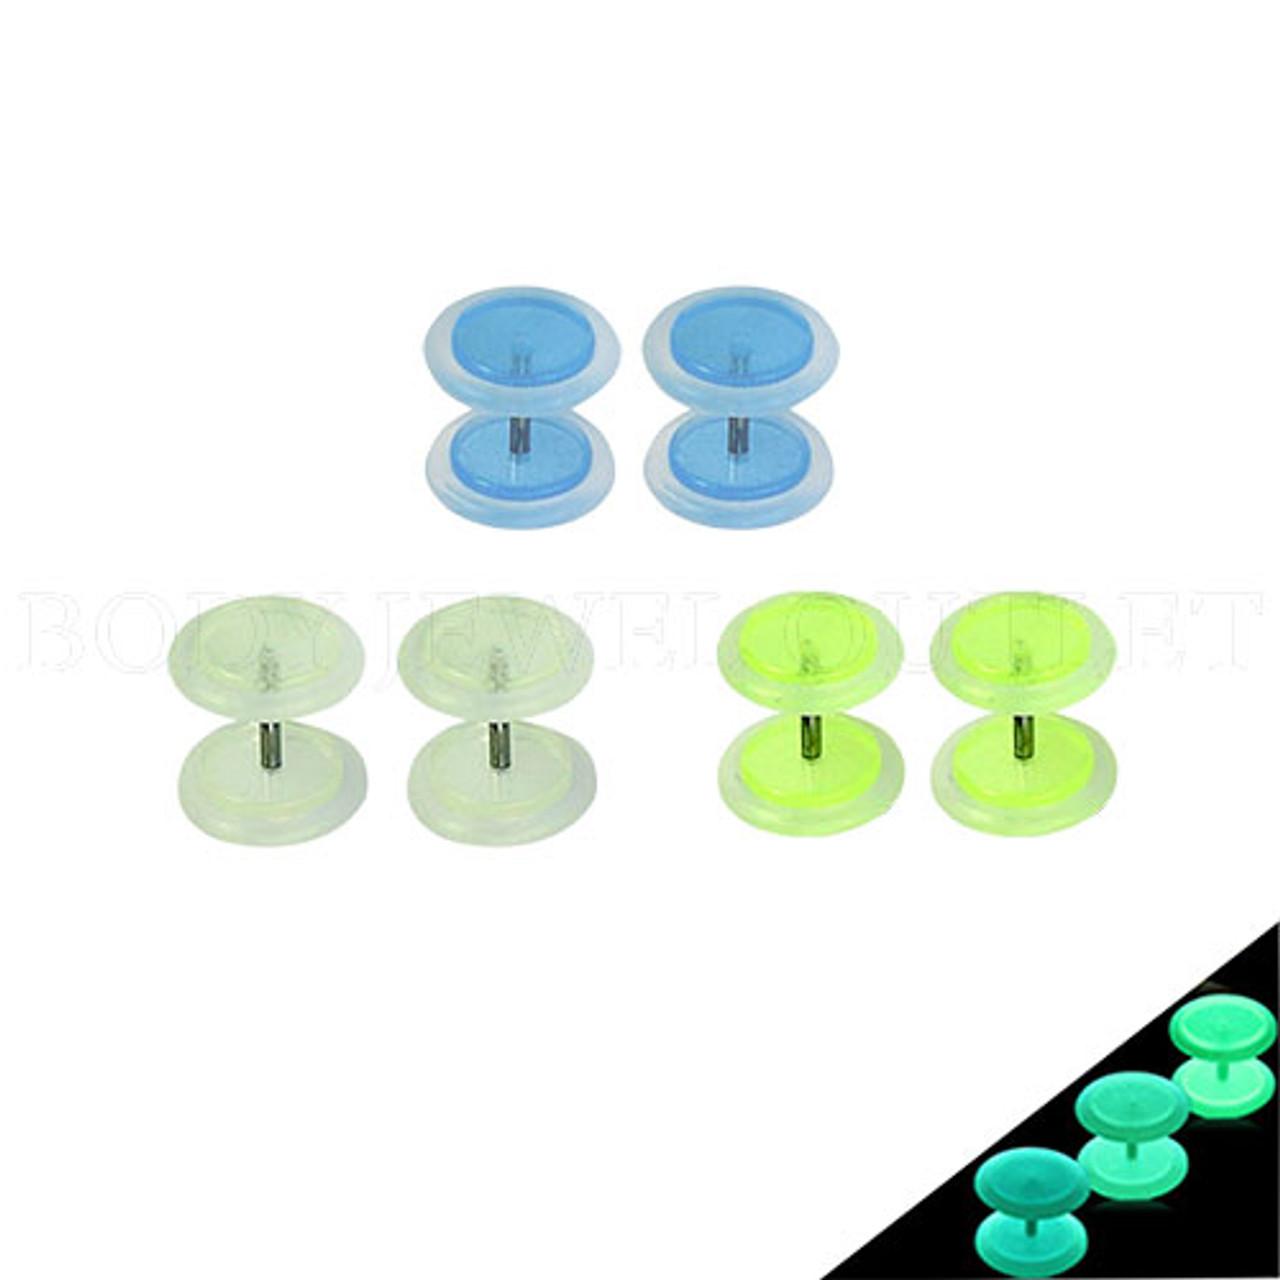 GLOW in the Dark Green - Acrylic Fake Plug - 0G Look - Screw On Earrings - Pair (2 pieces)